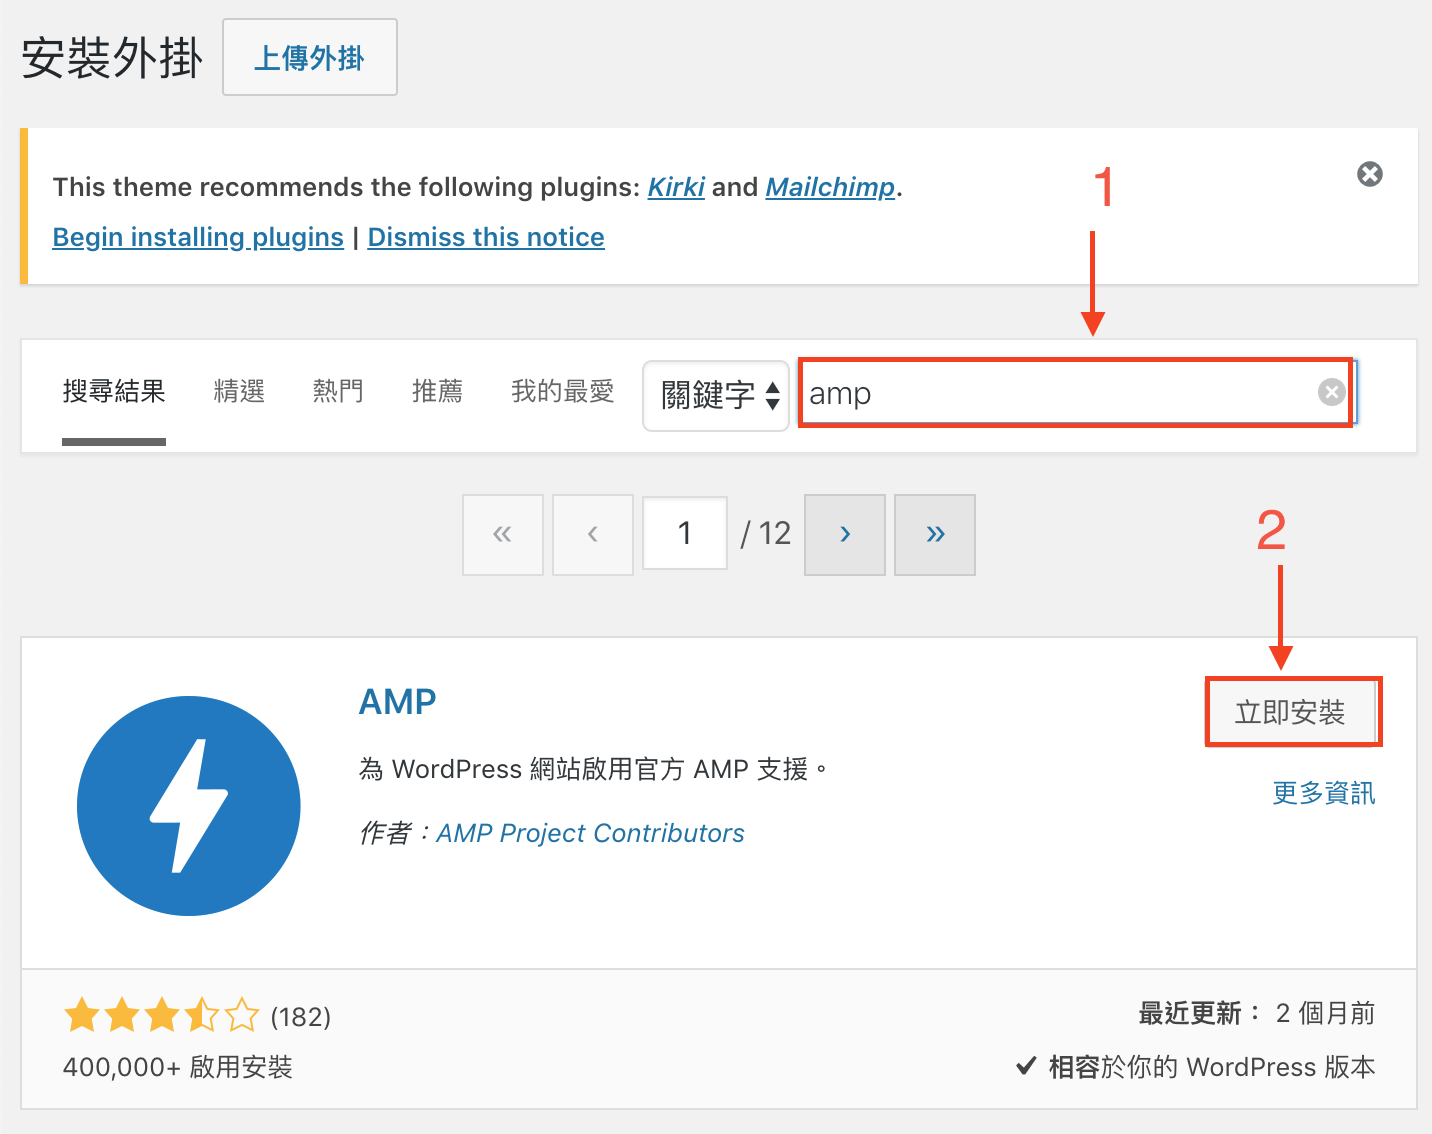 BLOGIMOVE外掛| 超級簡易AMP優化工具 ,三個步驟輕鬆優化官方AMP外掛的內容 @Blog-i-Move